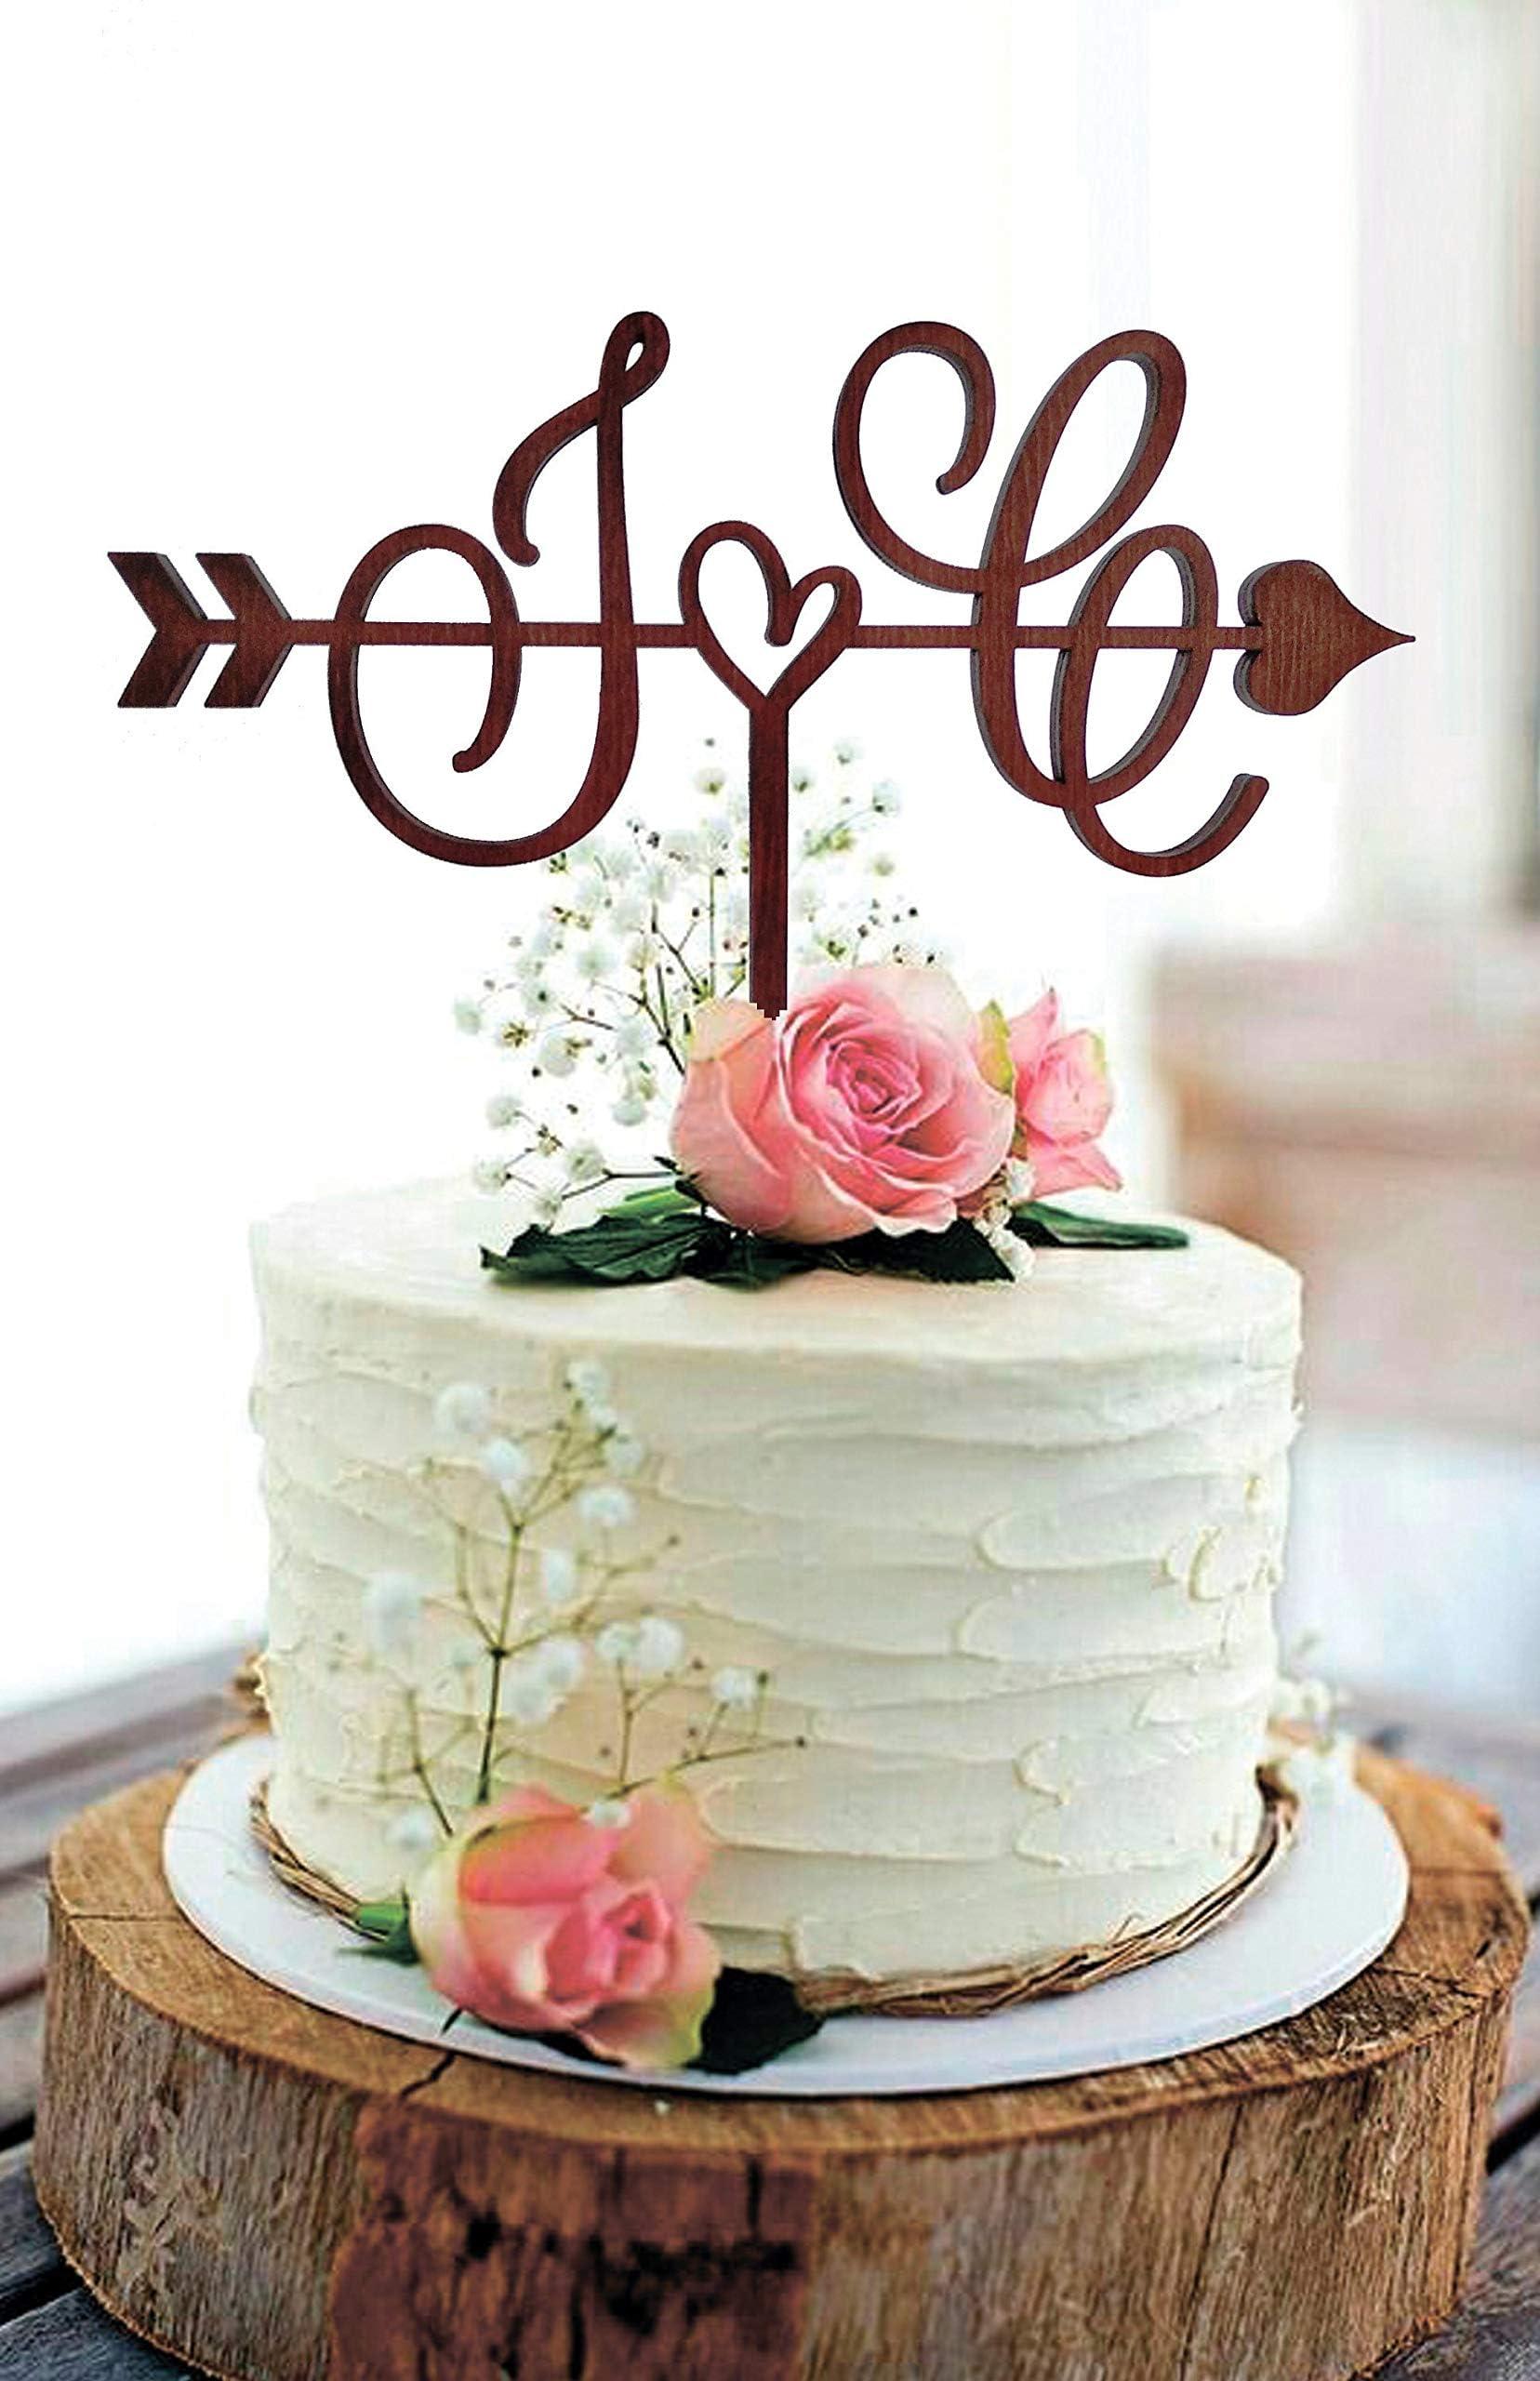 wedding wooden caketopper for bride and groom Wedding Caketopper caketopper with initials Monogram Cake Topper customizable caketopper